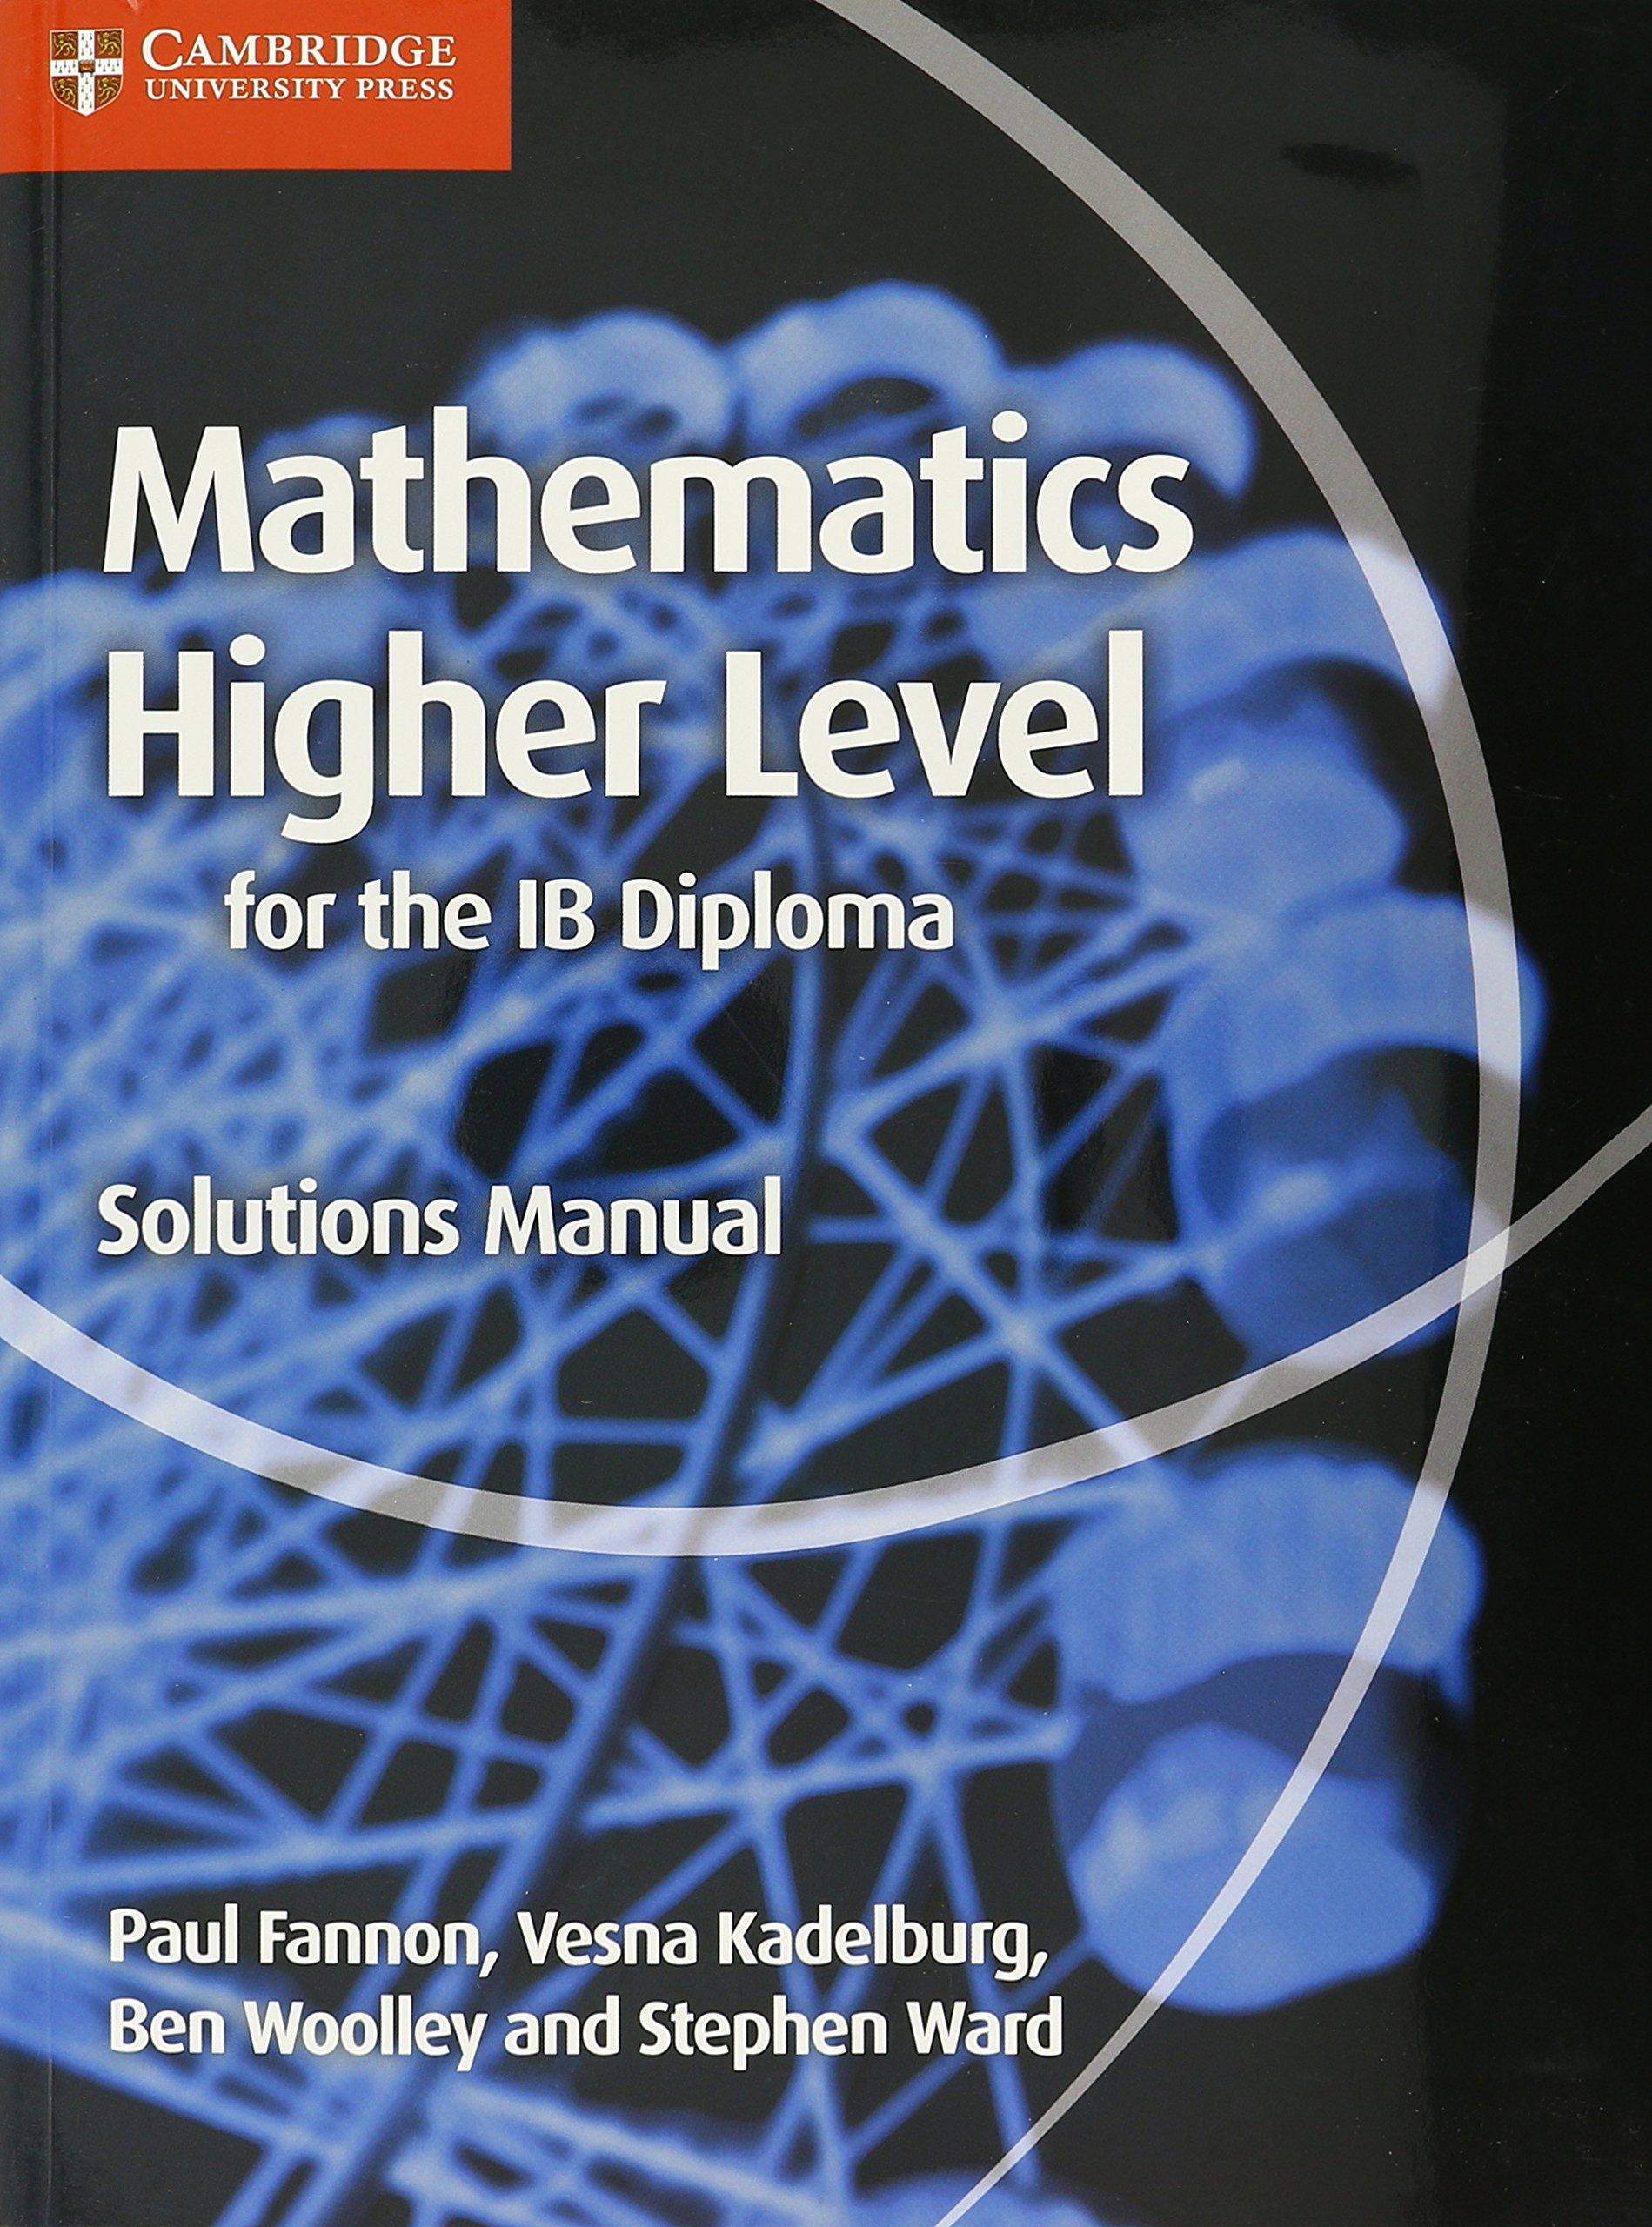 Mathematics for the IB Diploma Higher Level Solutions Manual Maths for the  IB Diploma: Amazon.de: Paul Fannon, Vesna Kadelburg, Ben Woolley, Stephen  Ward: ...